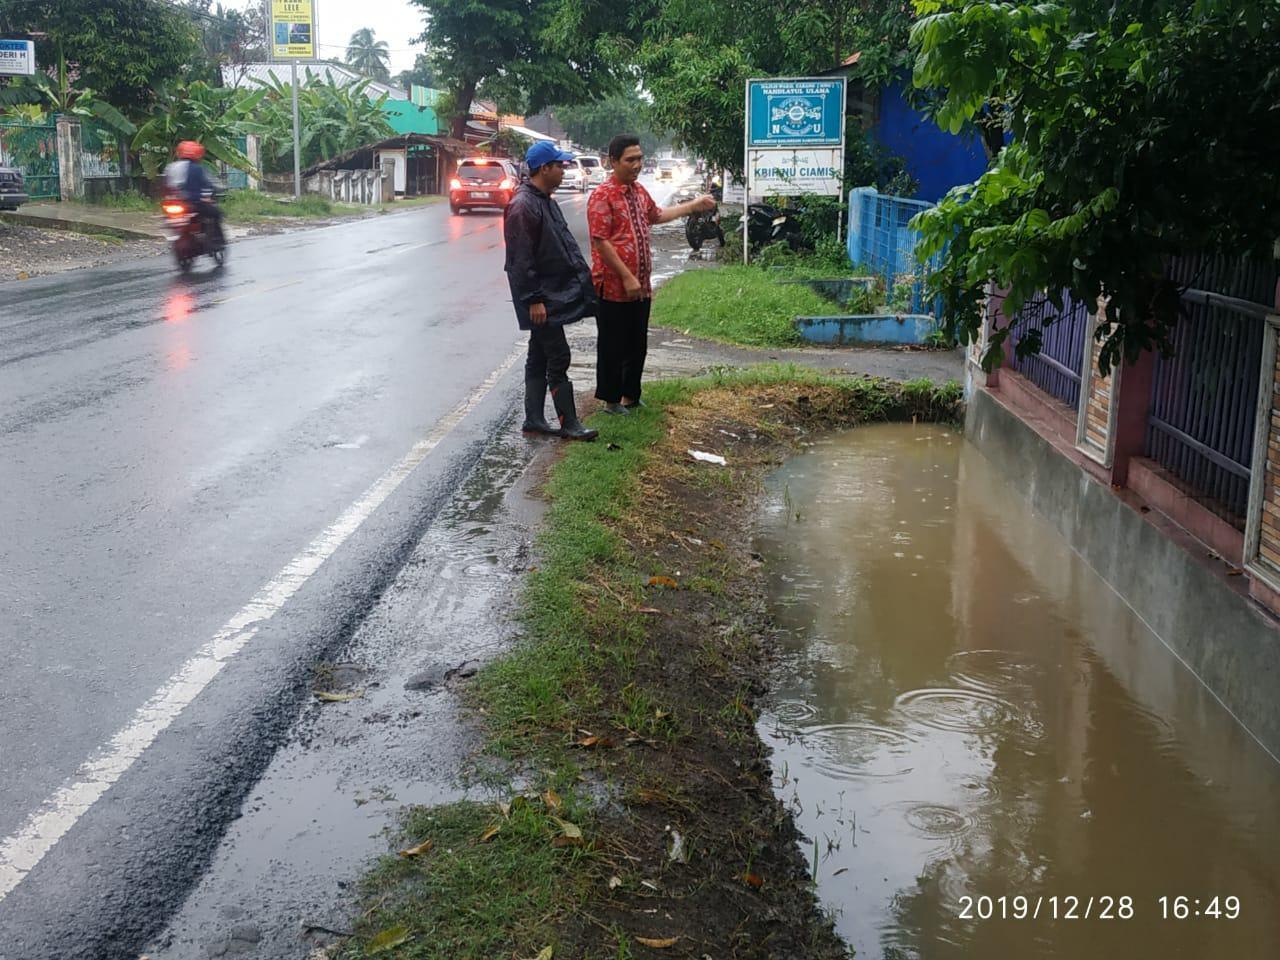 Jelang Tahun Baru, Warga Desa Ciherang Disambut Banjir